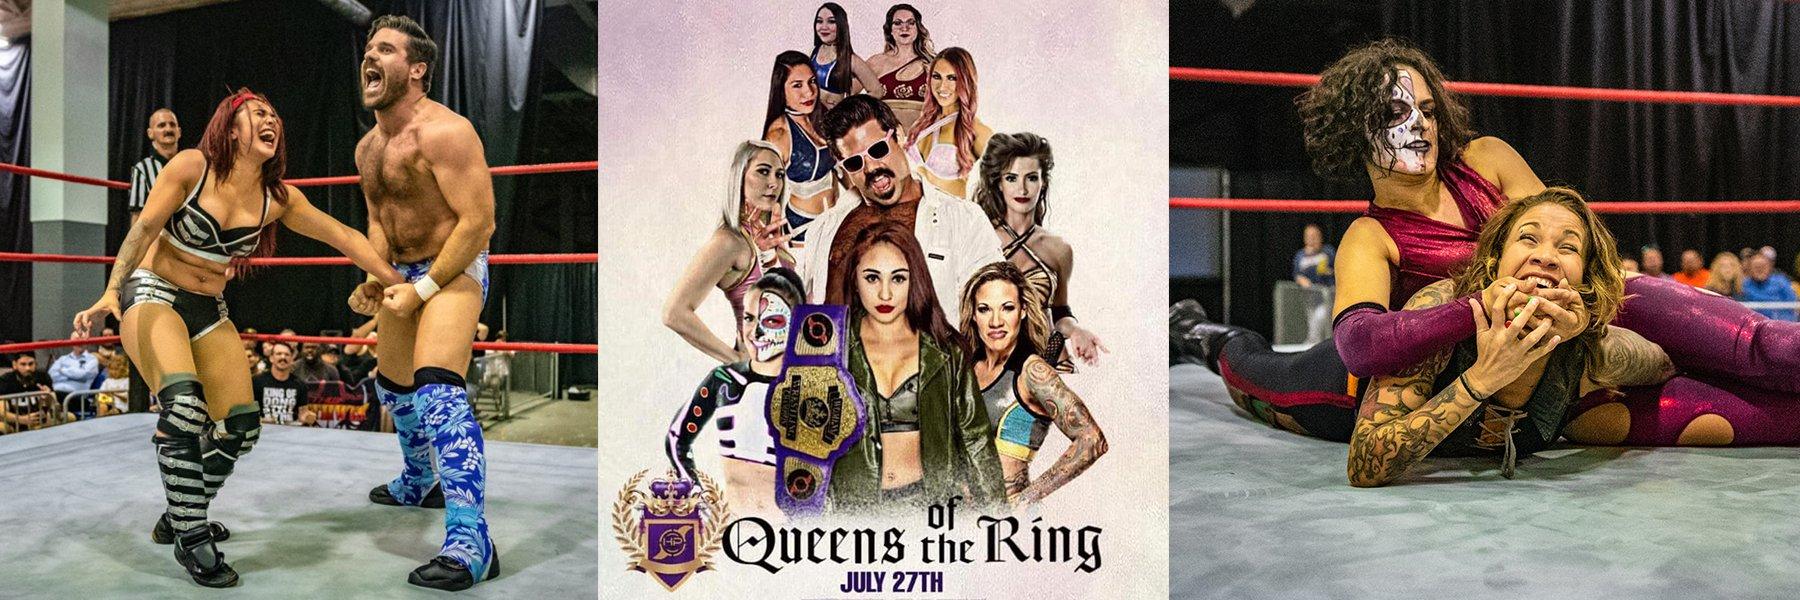 WATCH: Queens of the Ring iPPV - Miranda, Joey Ryan, Mercedes, Thunder Rosa